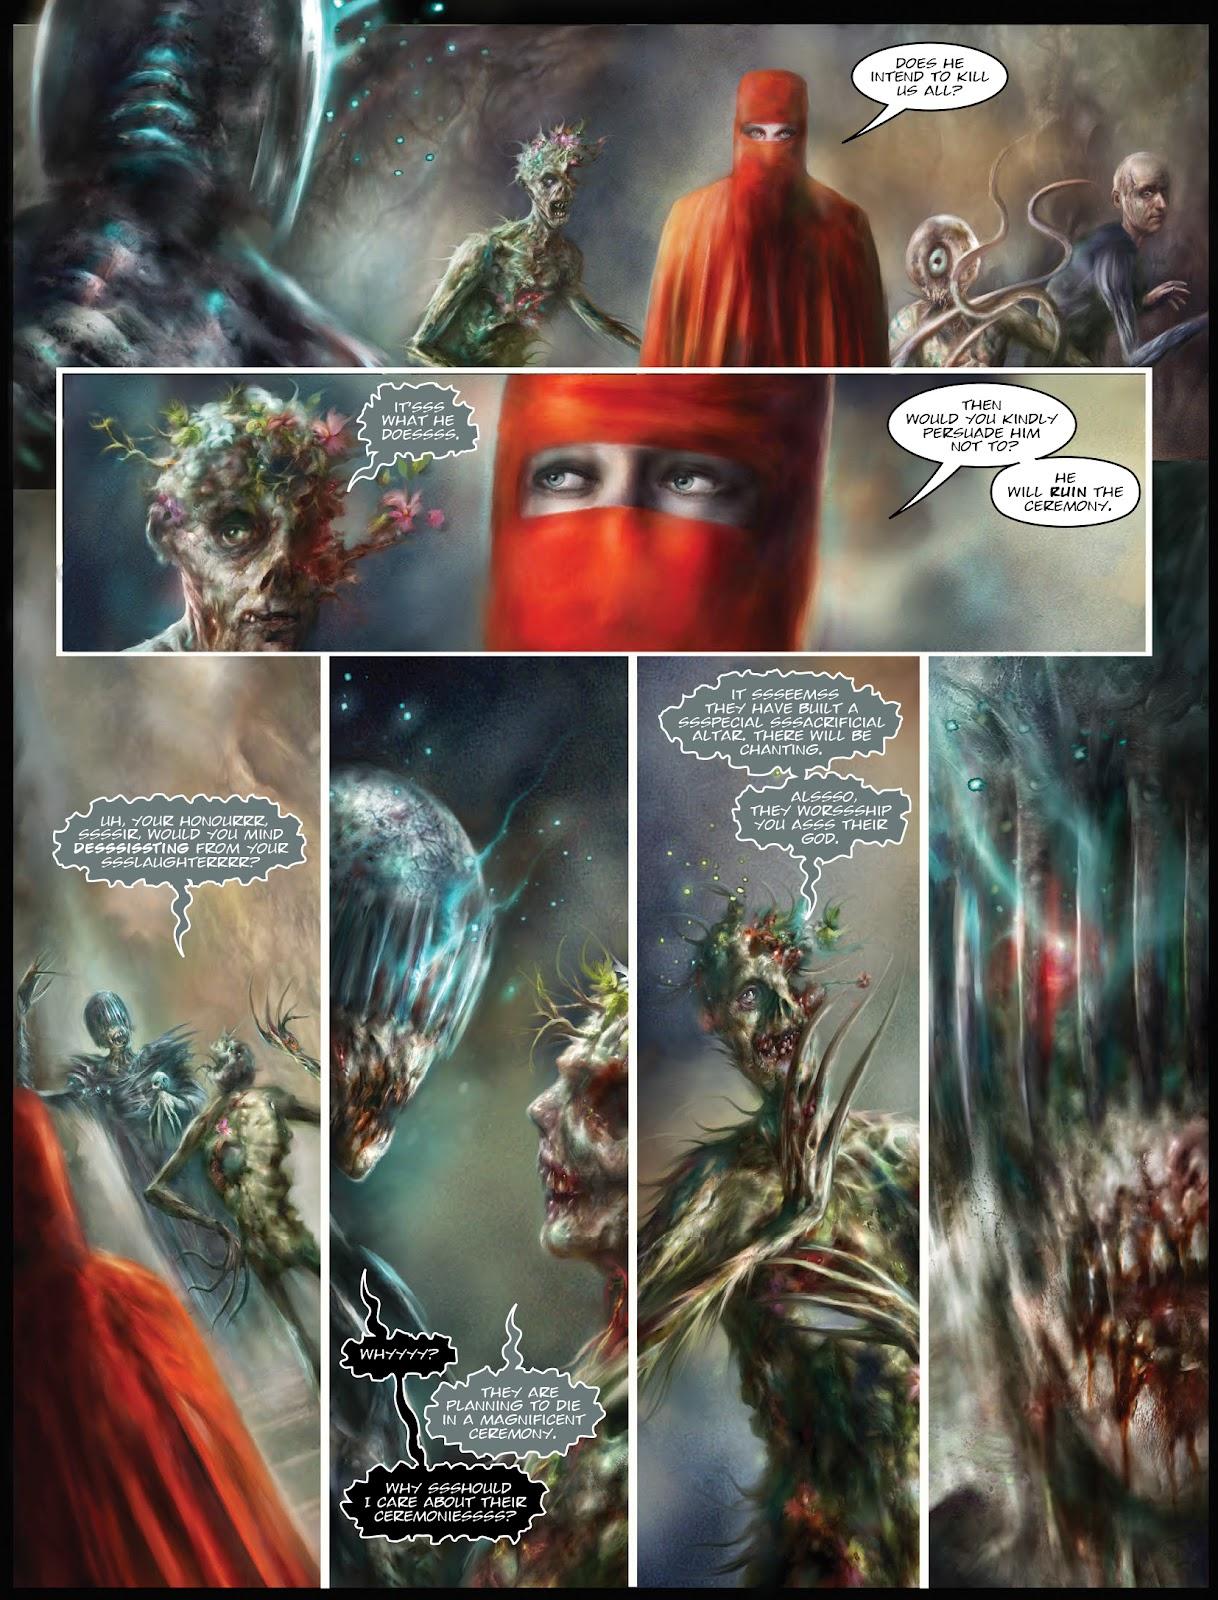 Judge Dredd Megazine (Vol. 5) issue 427 - Page 57